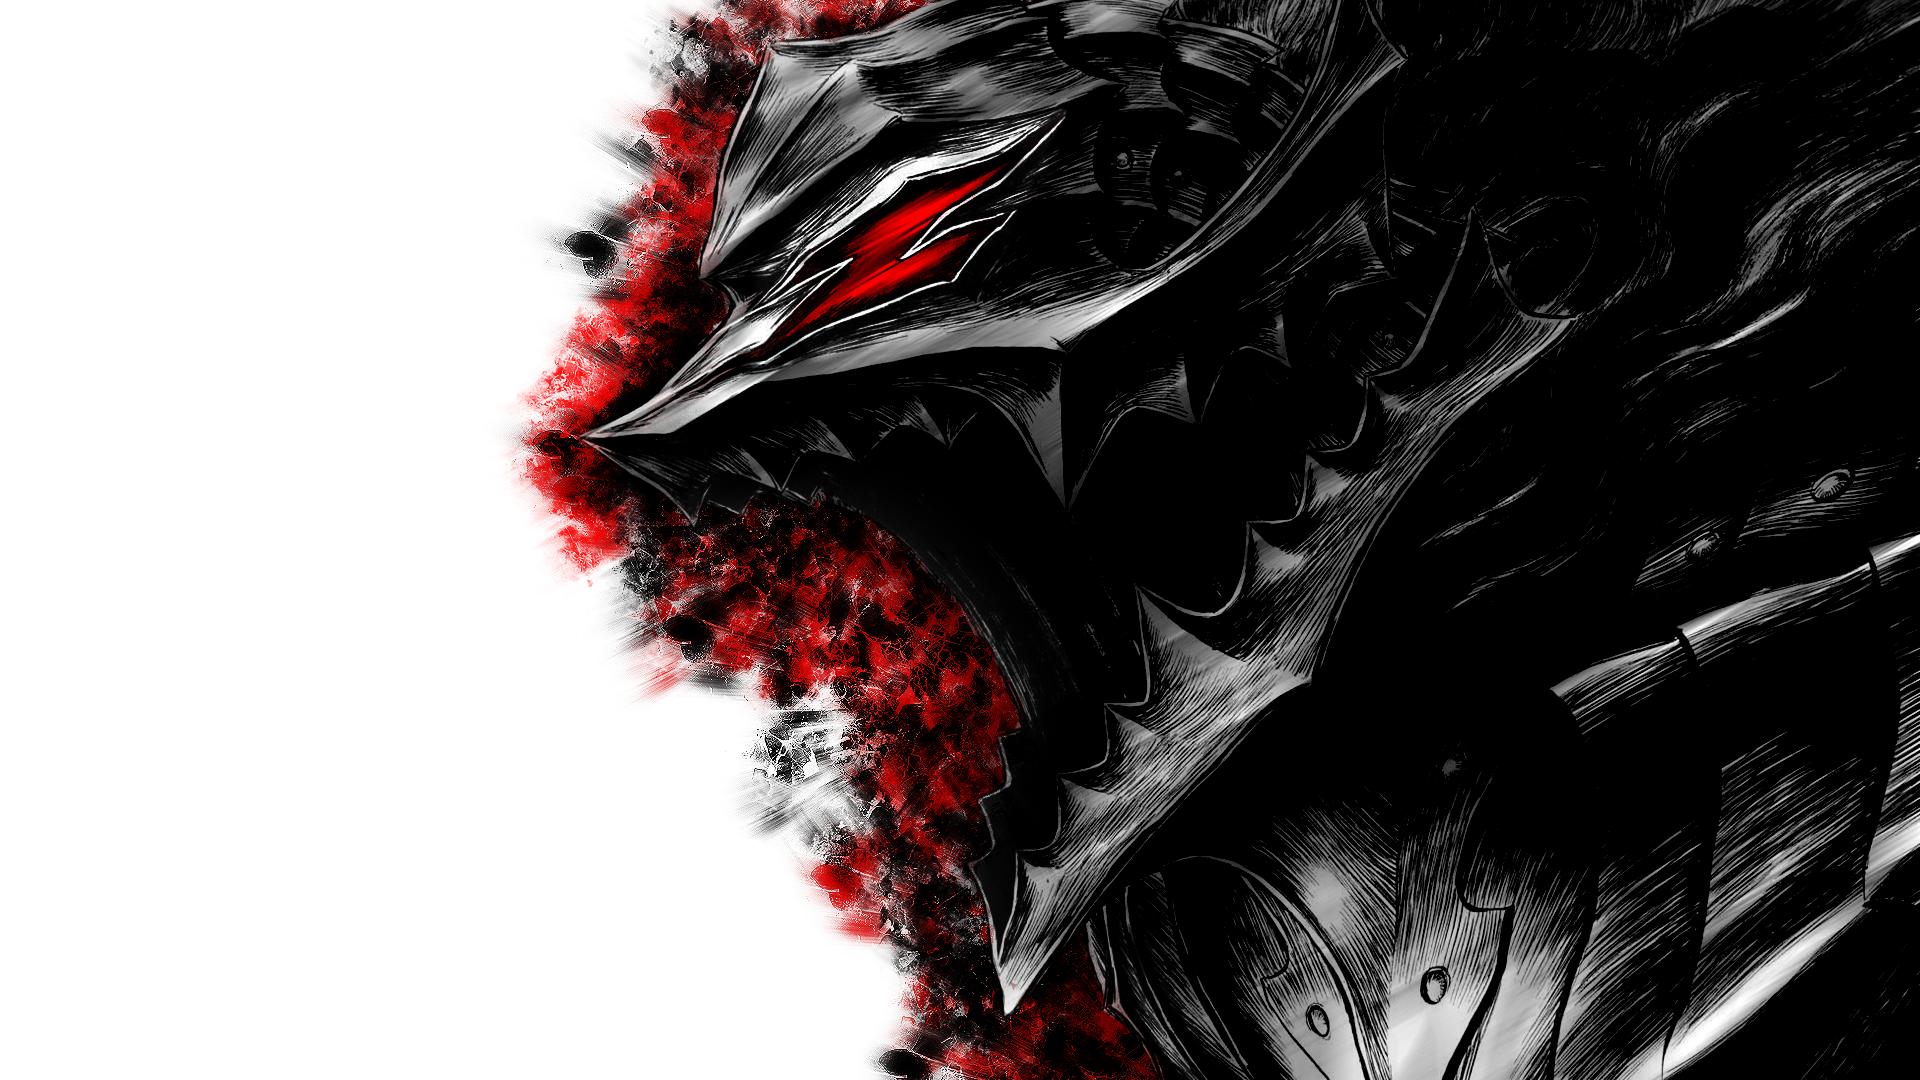 Guts Black Berserk Rage By Drace Sylvanian Deviantart Com On